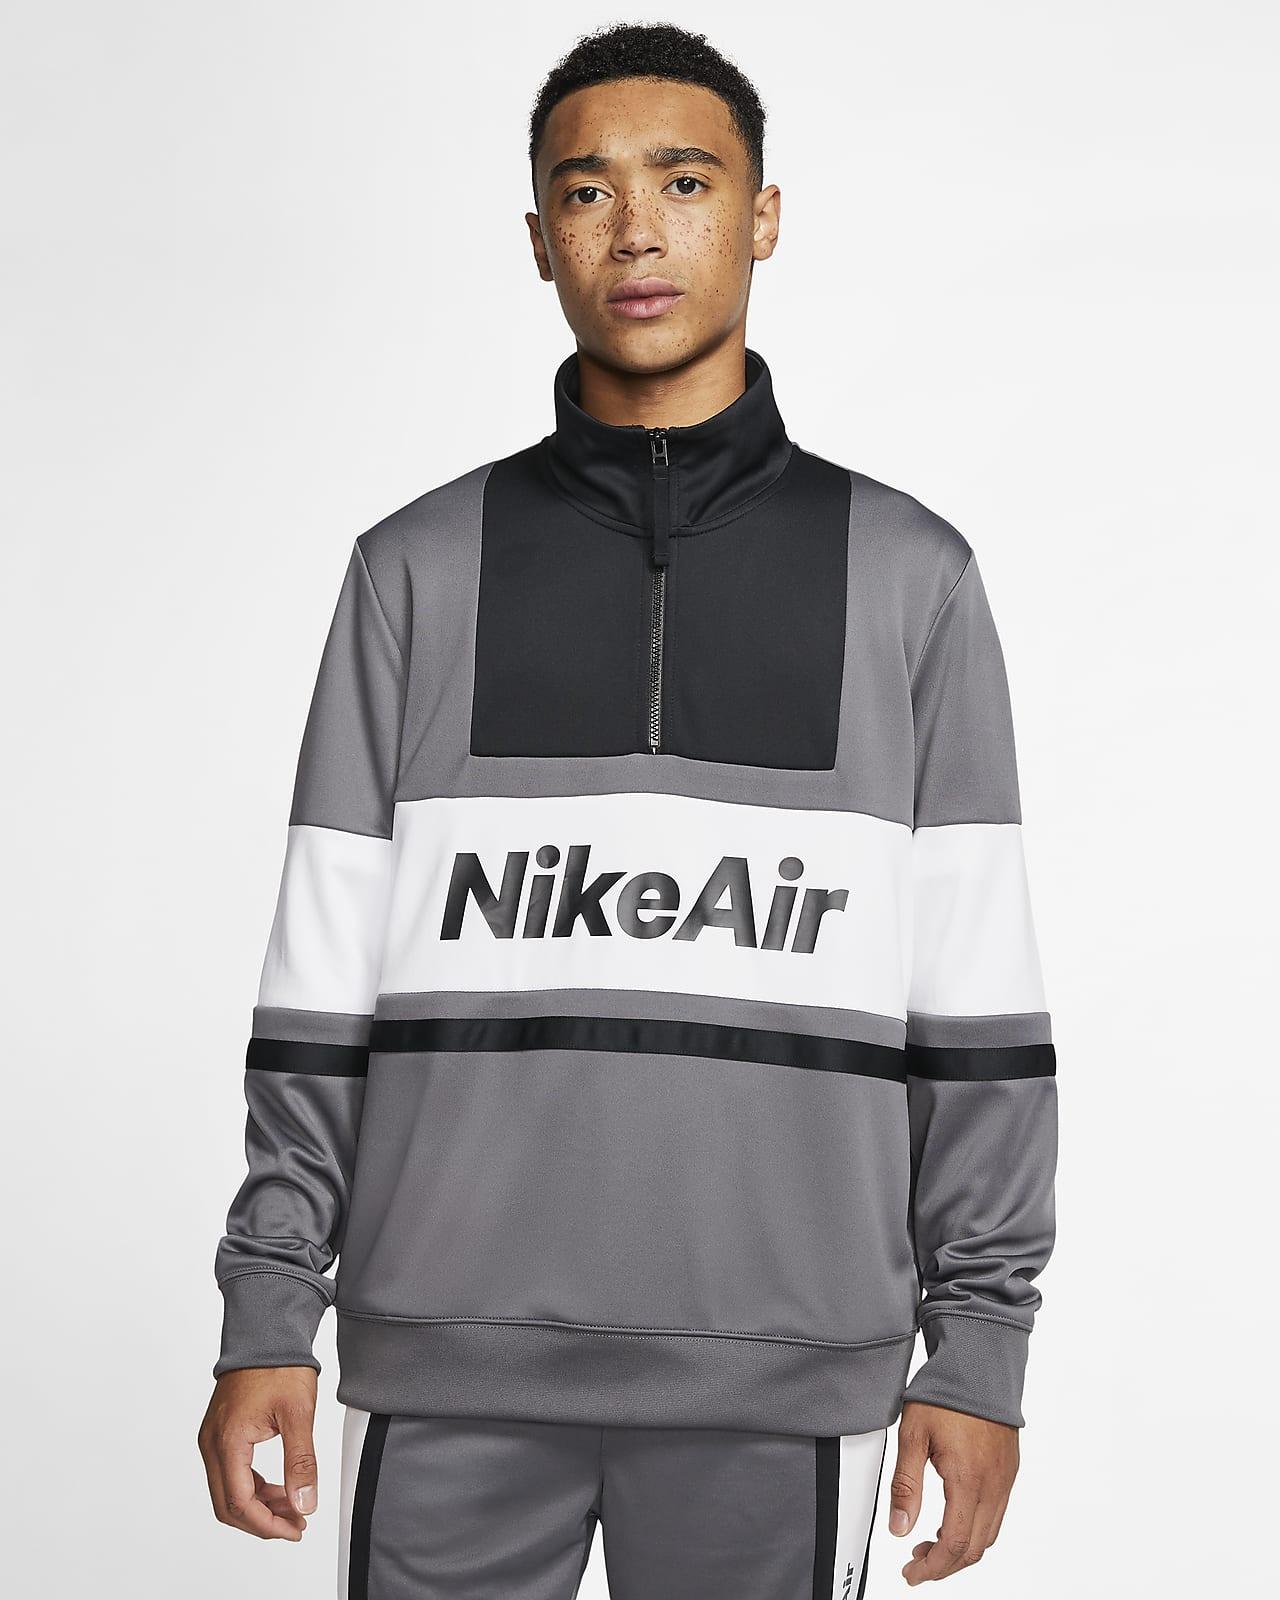 Firmar fusión celestial  Nike Air Men's Jacket. Nike AU